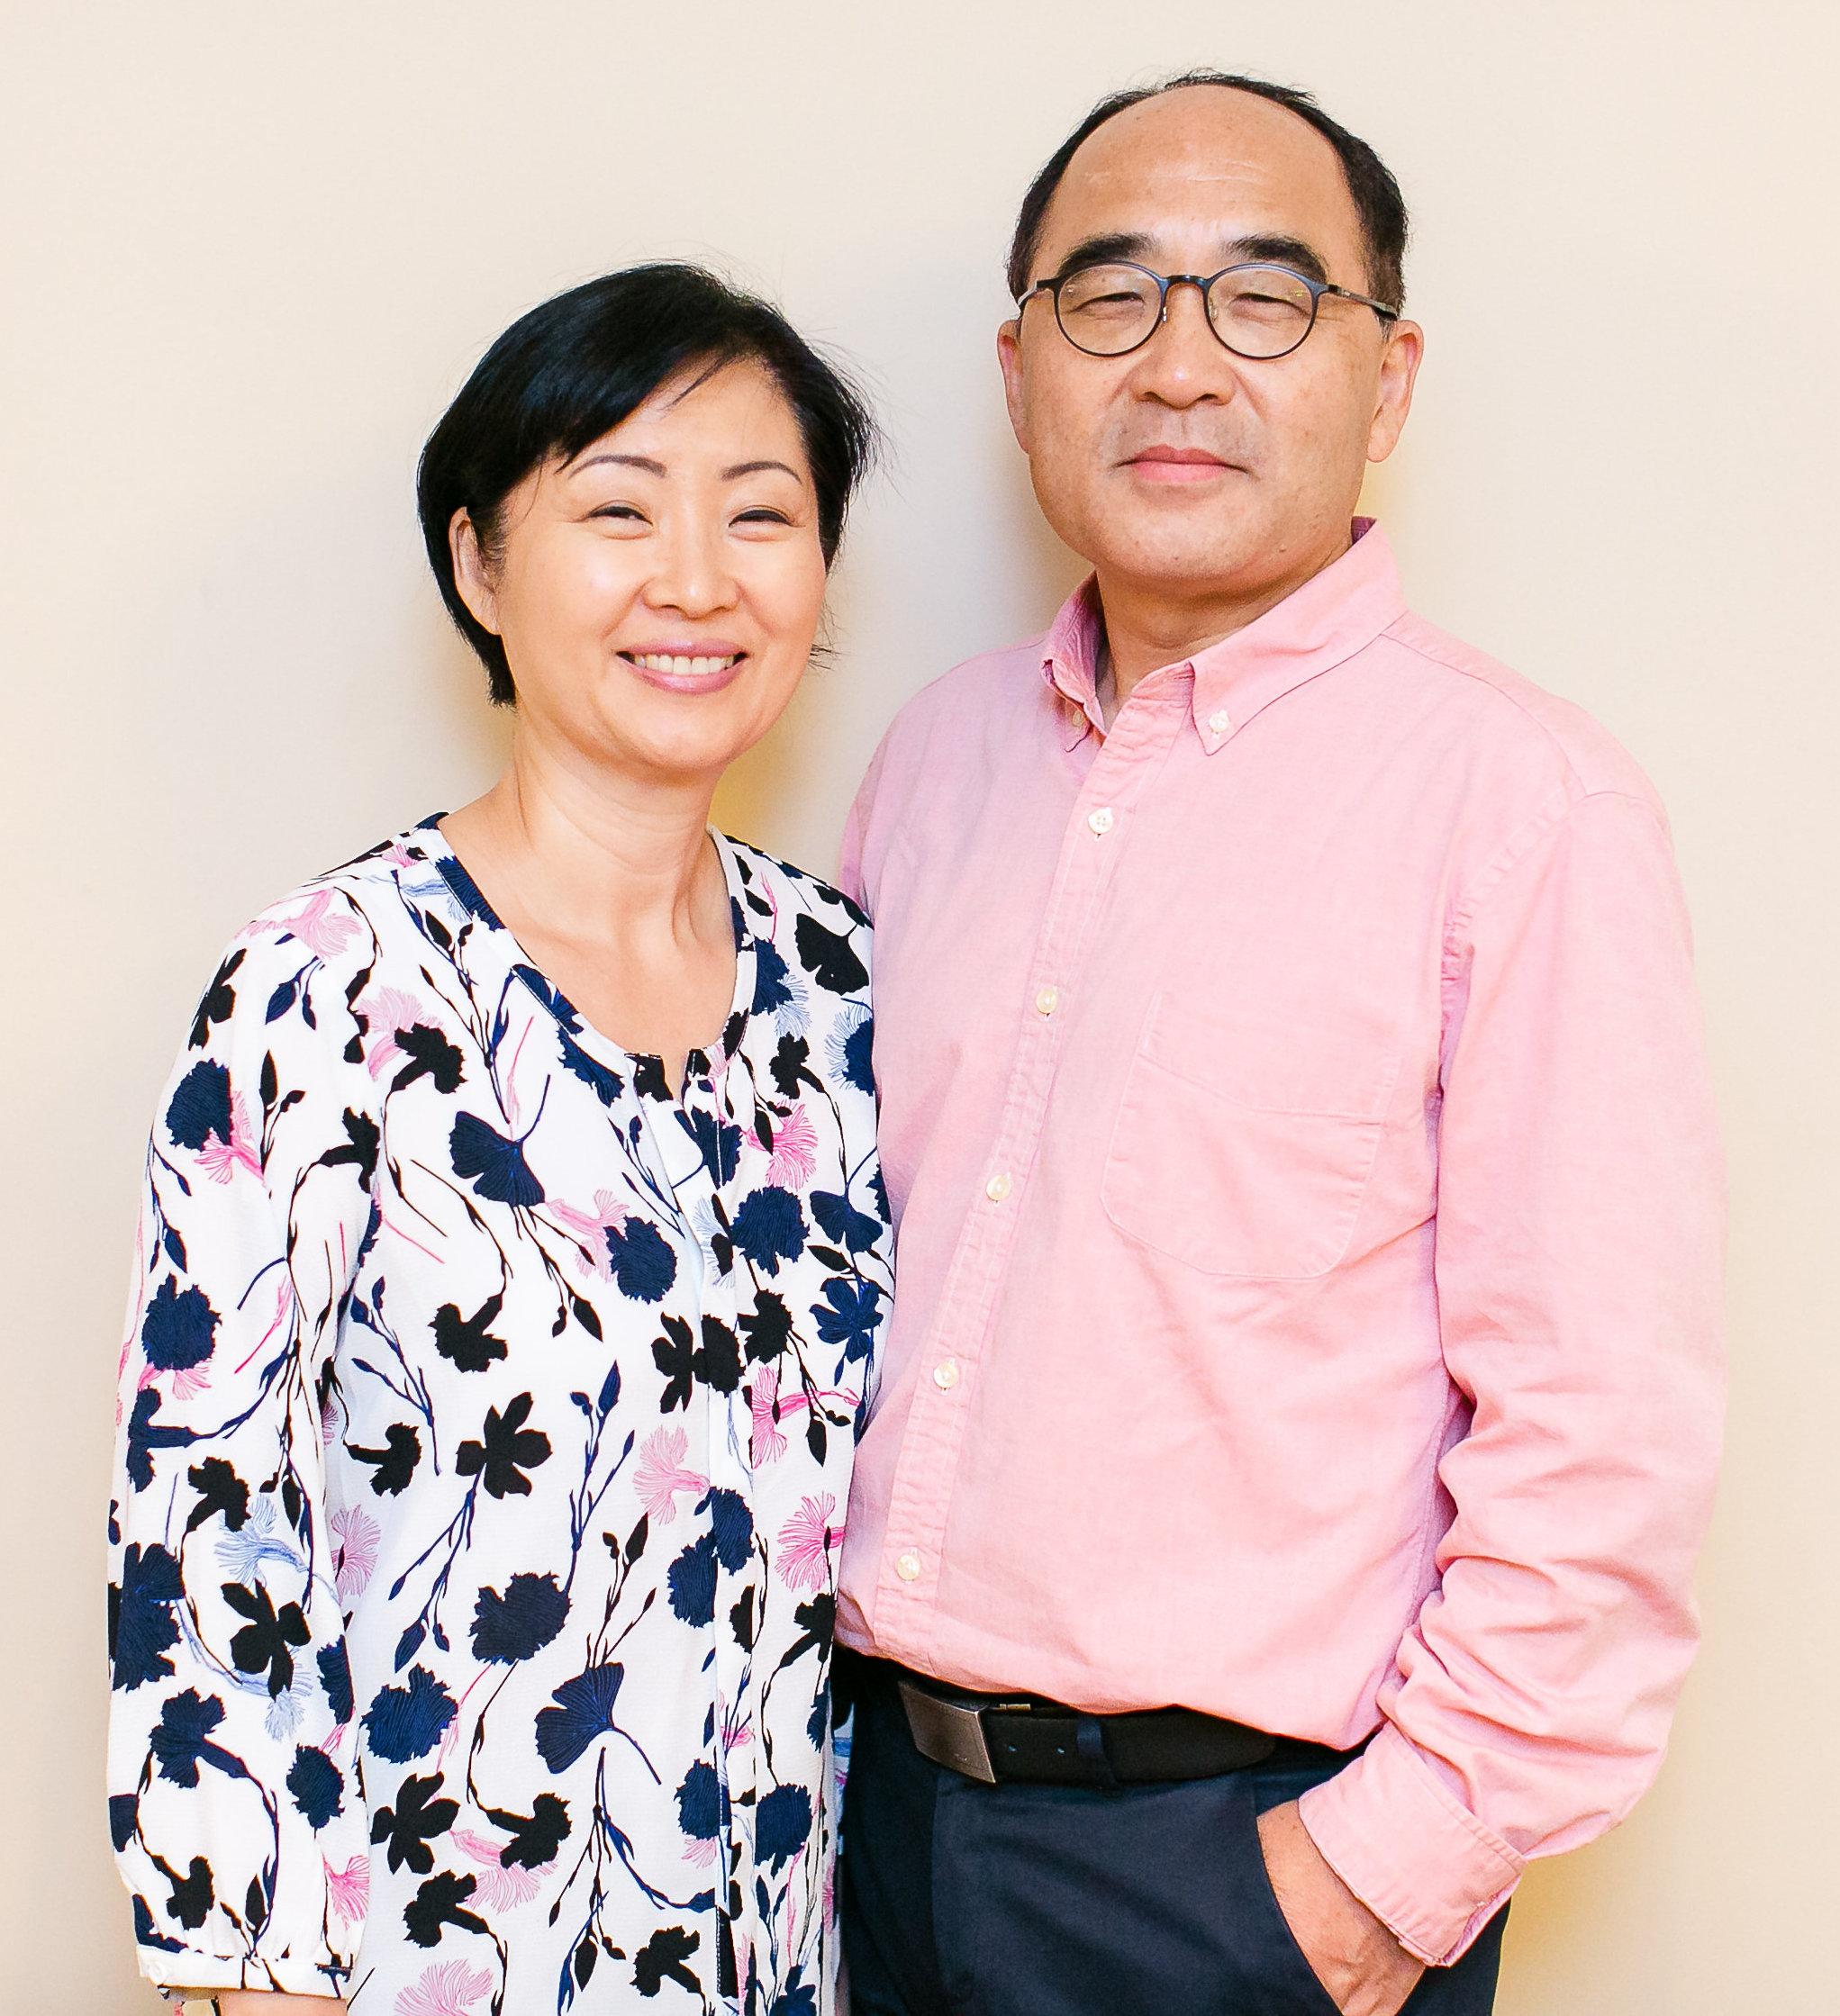 Kyu Kim | Lead Pastor, H.O.P.E Church